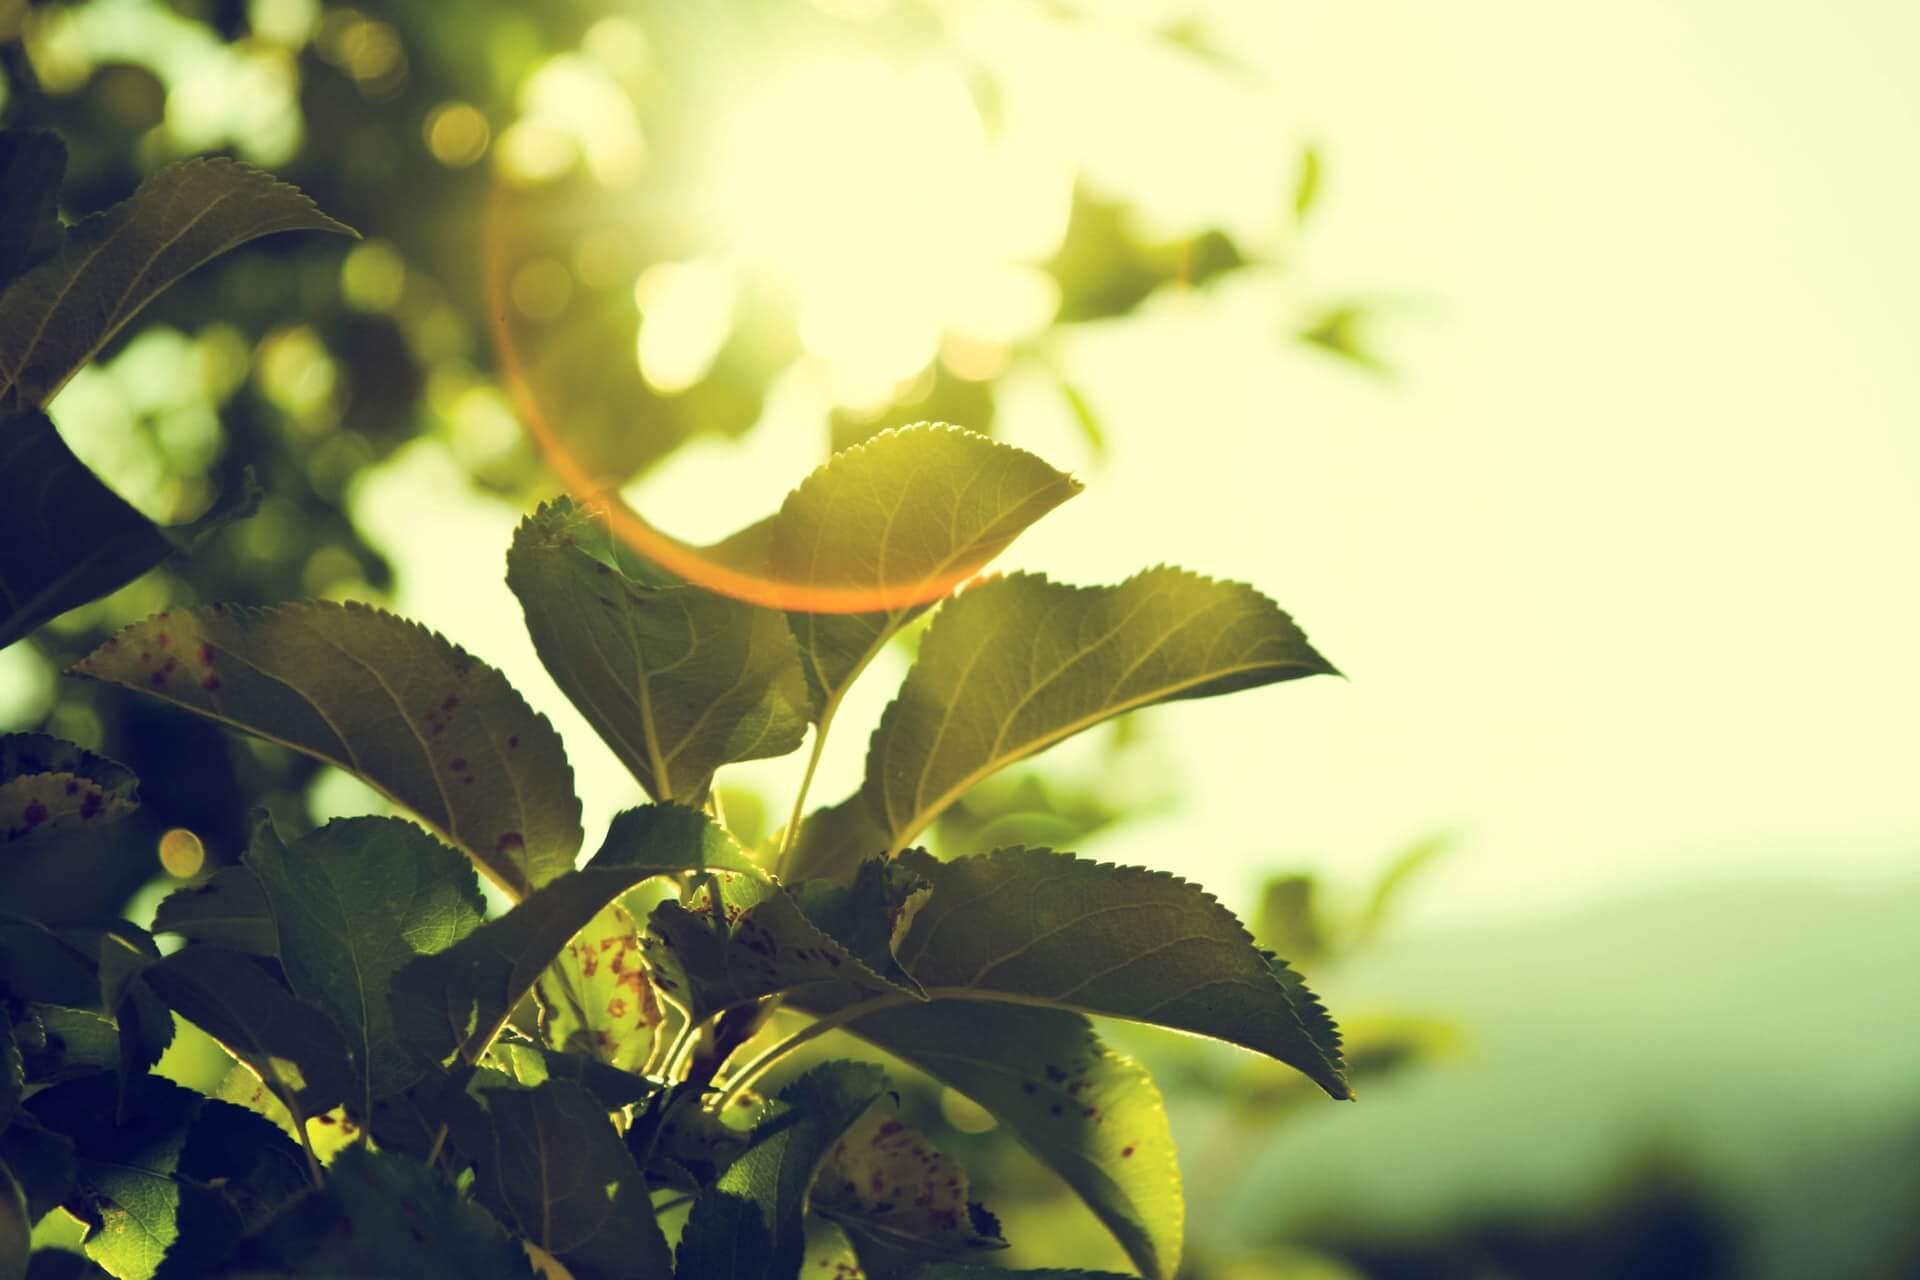 Végétation au soleil - Photo by Micah Hallahan on Unsplash